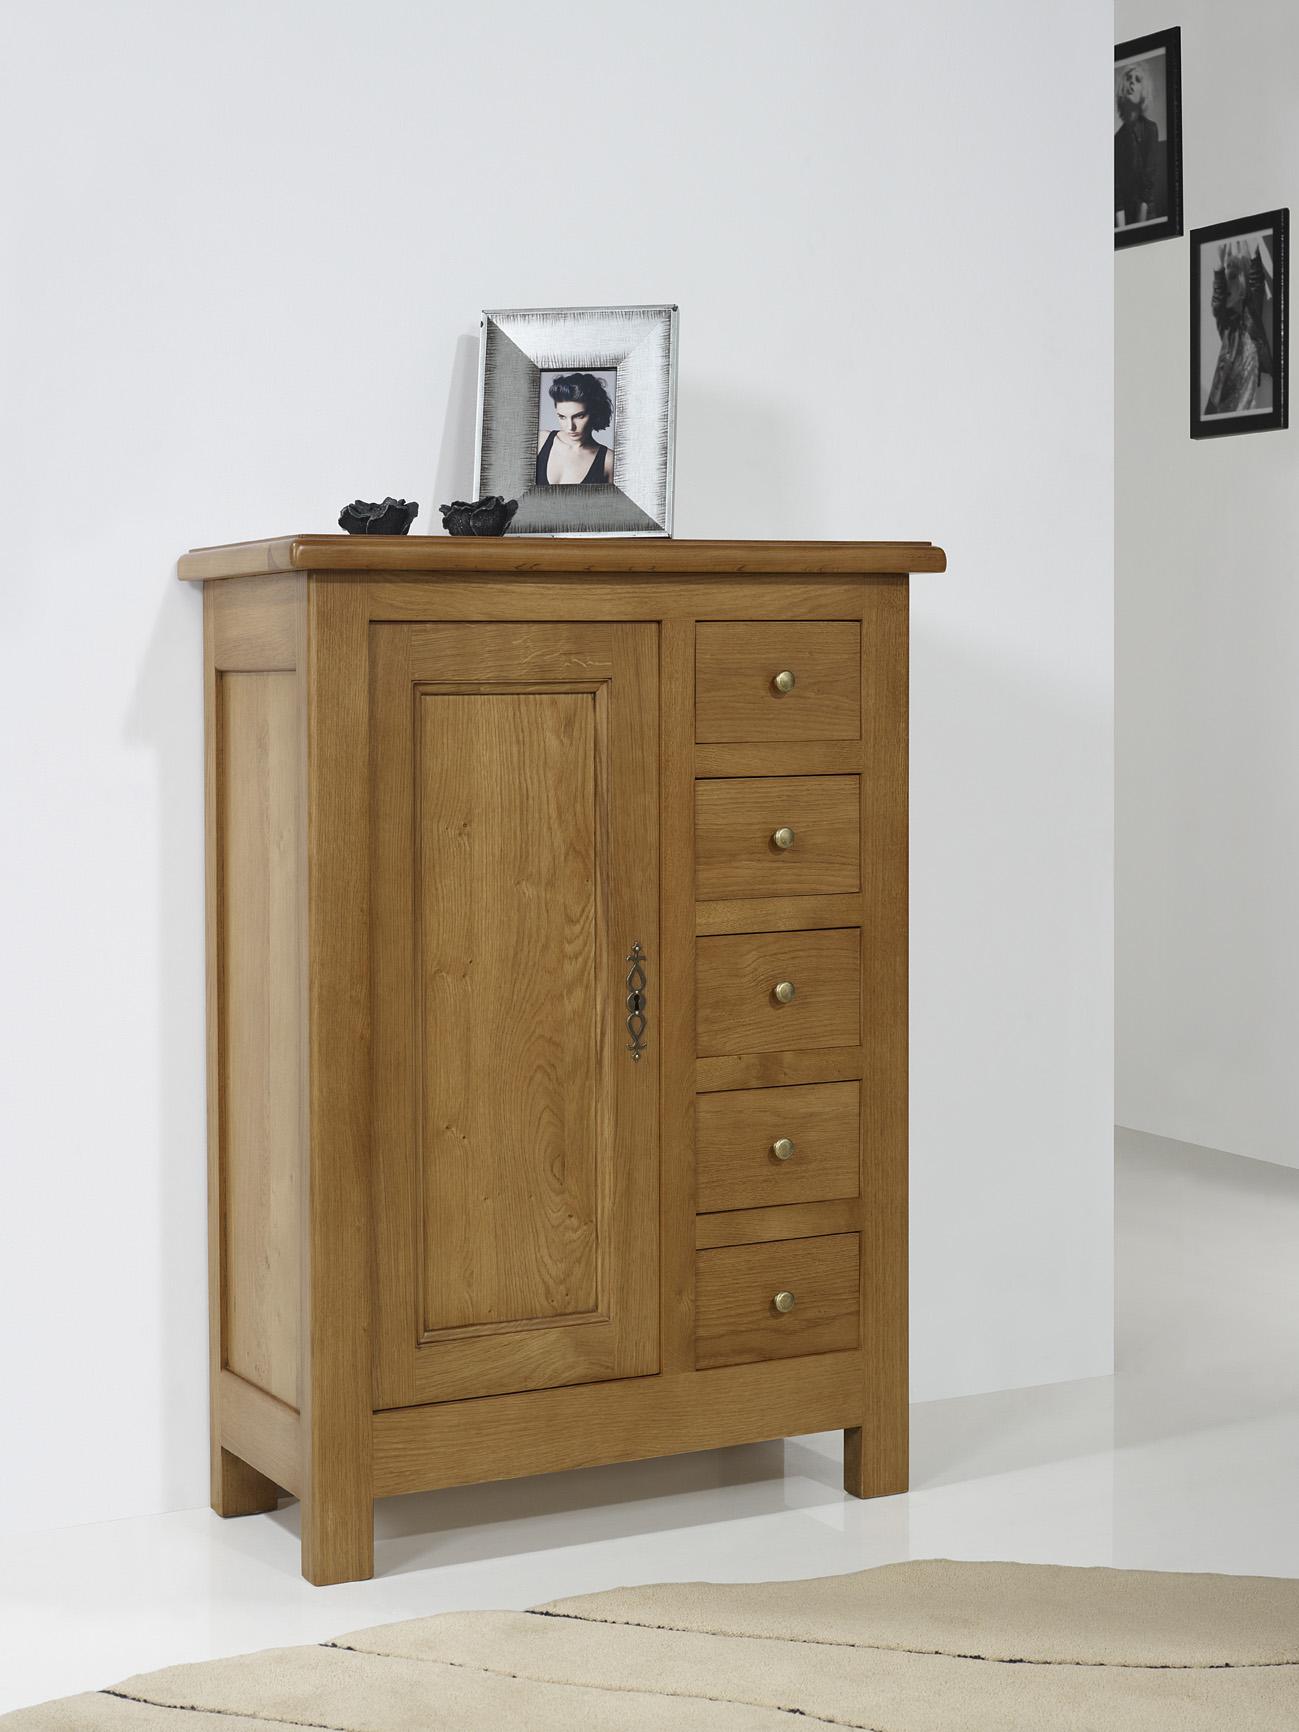 farinier 1 porte 5 tiroirs amaury en ch ne massif de style campagnard meuble en ch ne massif. Black Bedroom Furniture Sets. Home Design Ideas